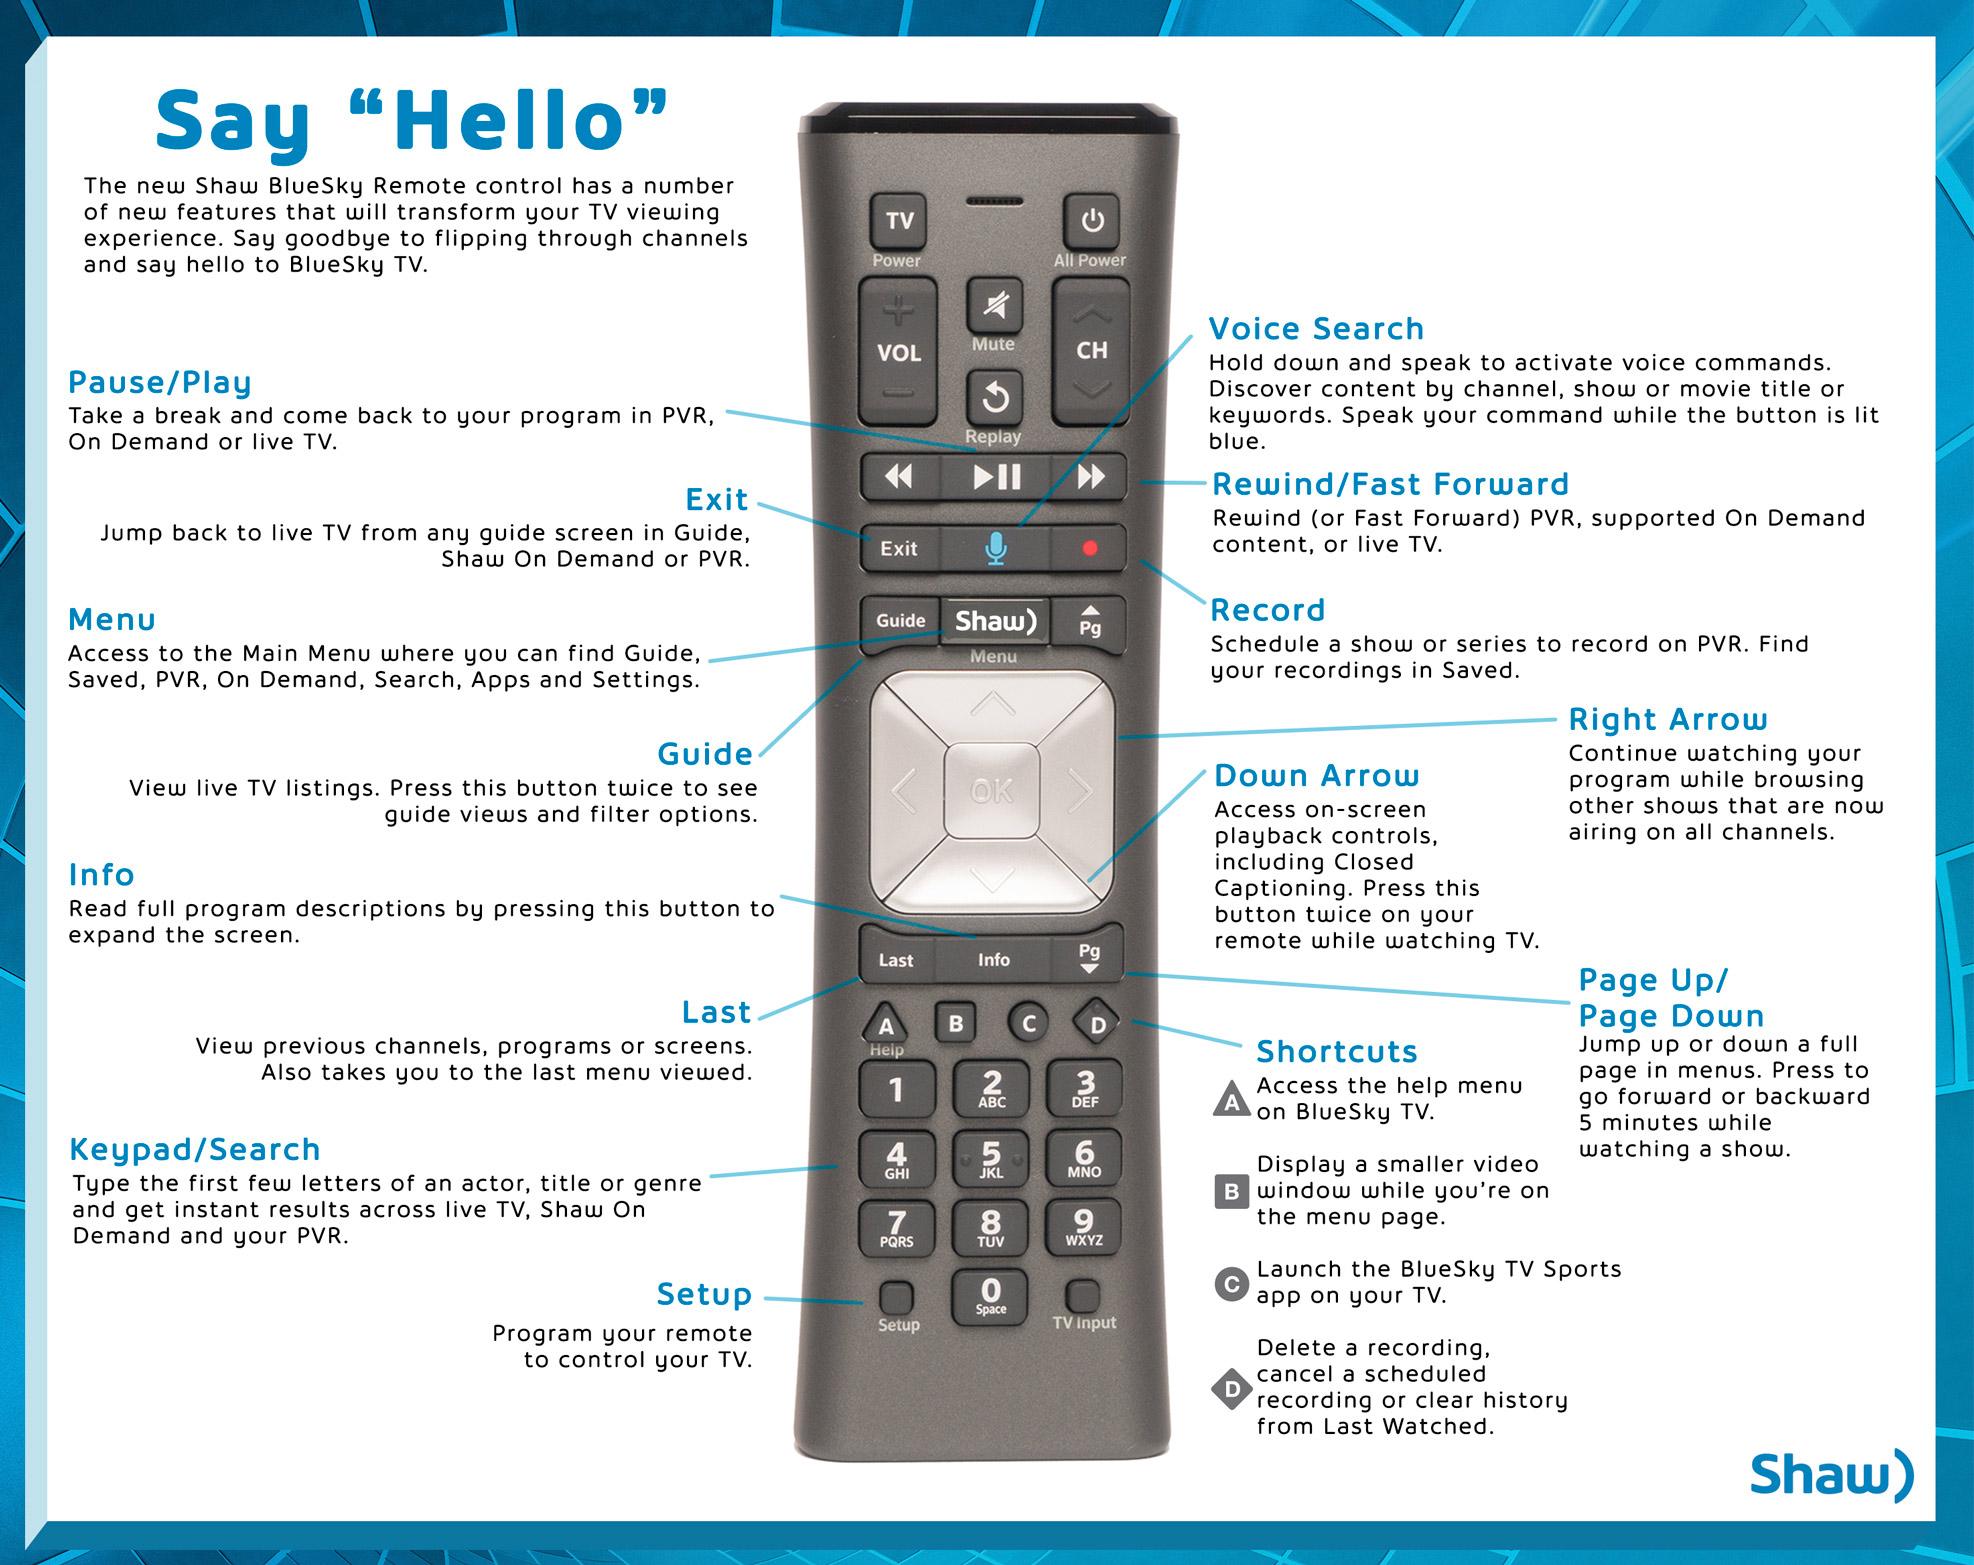 BlueSky TV Voice Remote